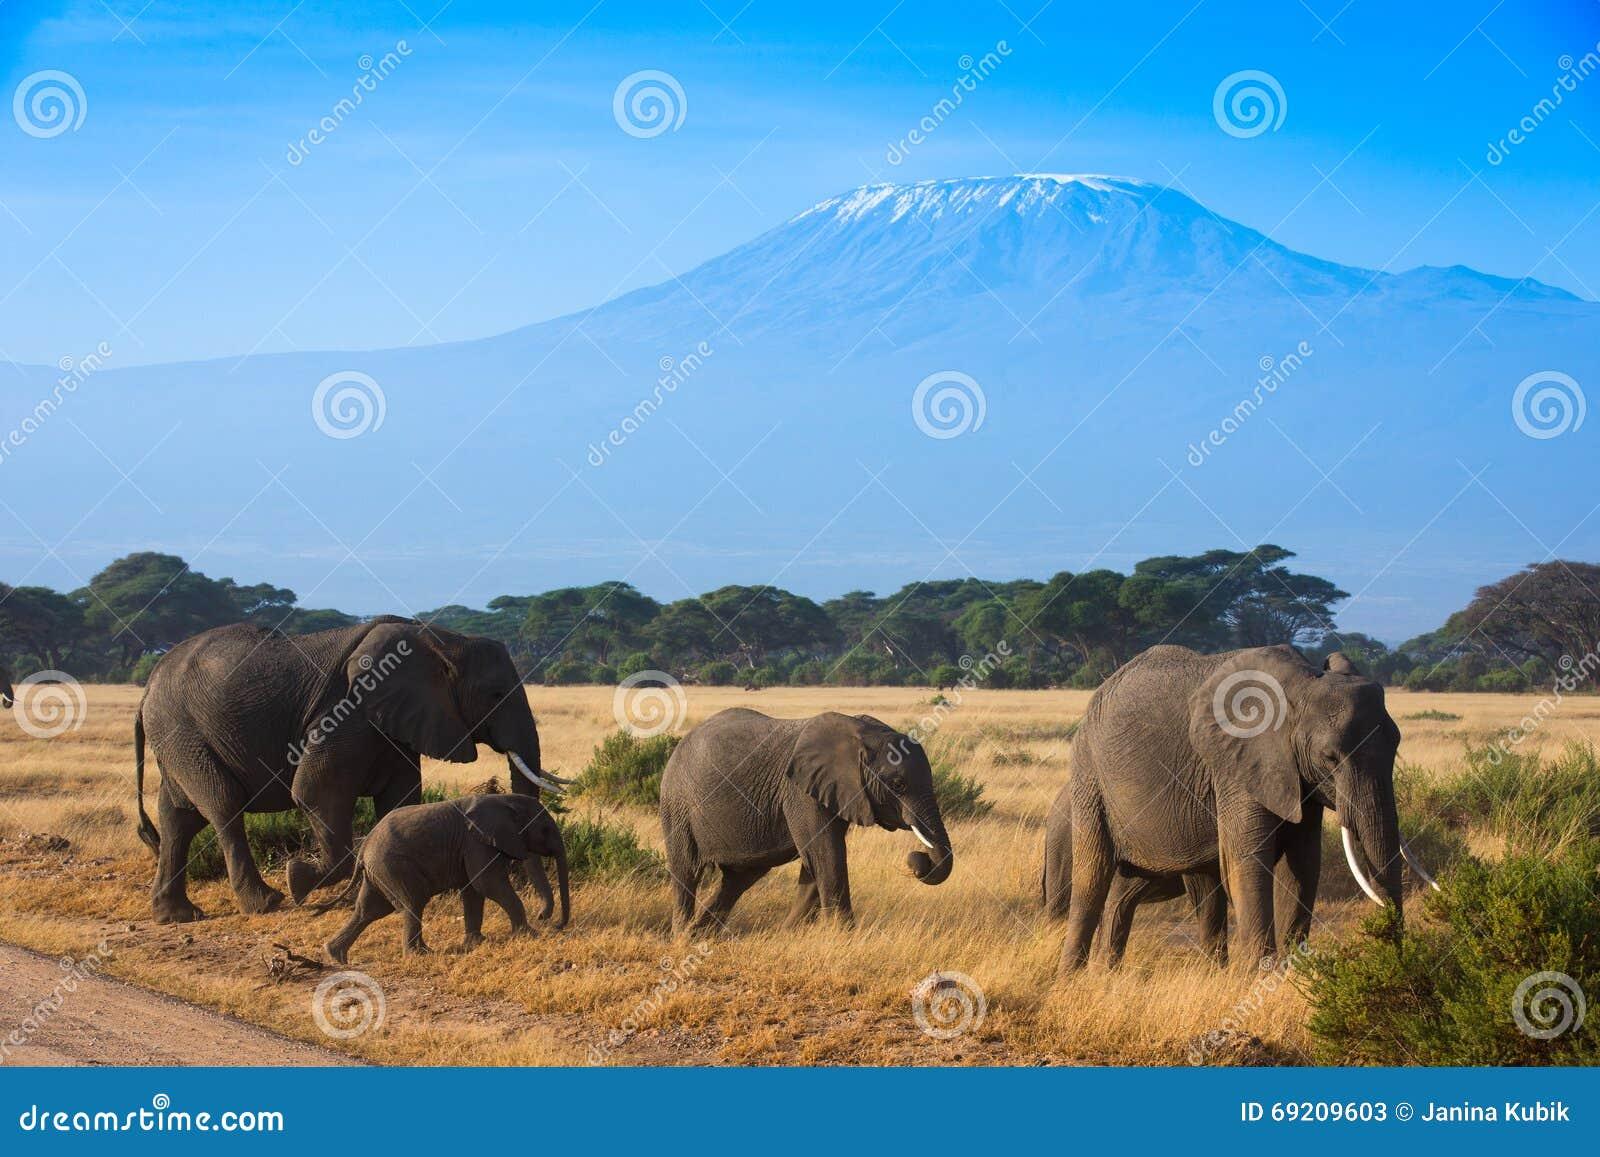 African mountain animals - African Animals Elephants Kilimanjaro Landscape Mountain